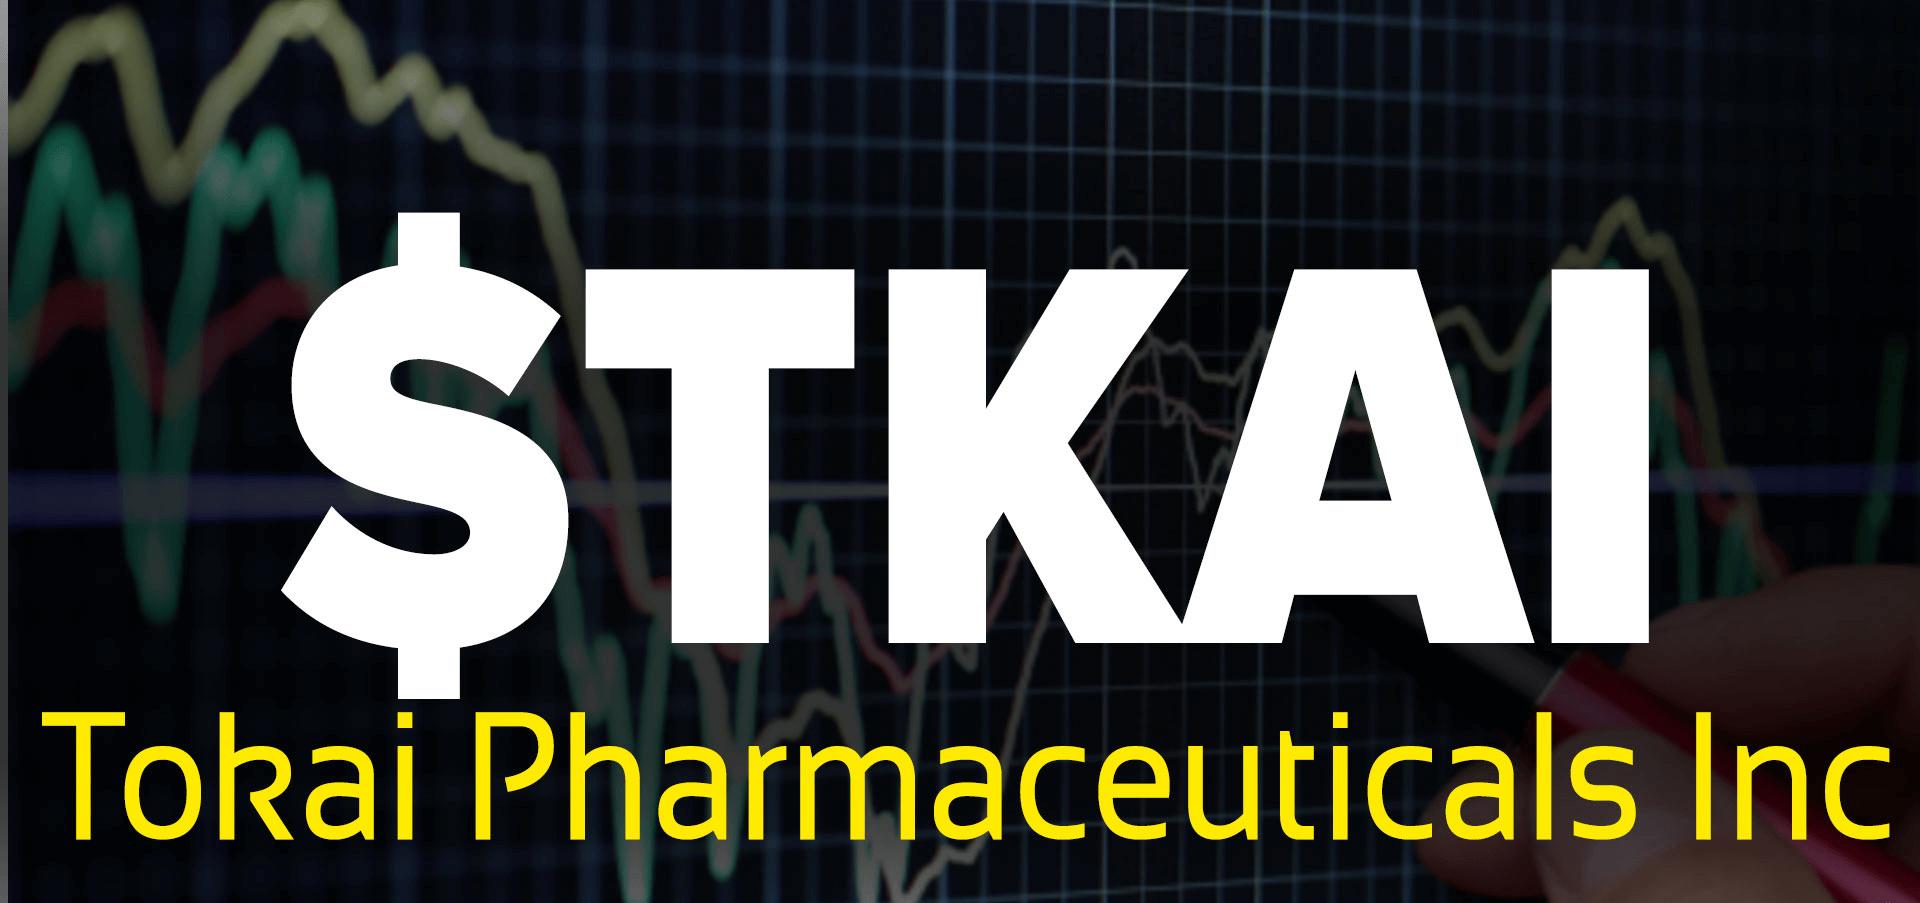 «Токай фармасьютикалс» (Tokai Pharmaceuticals).